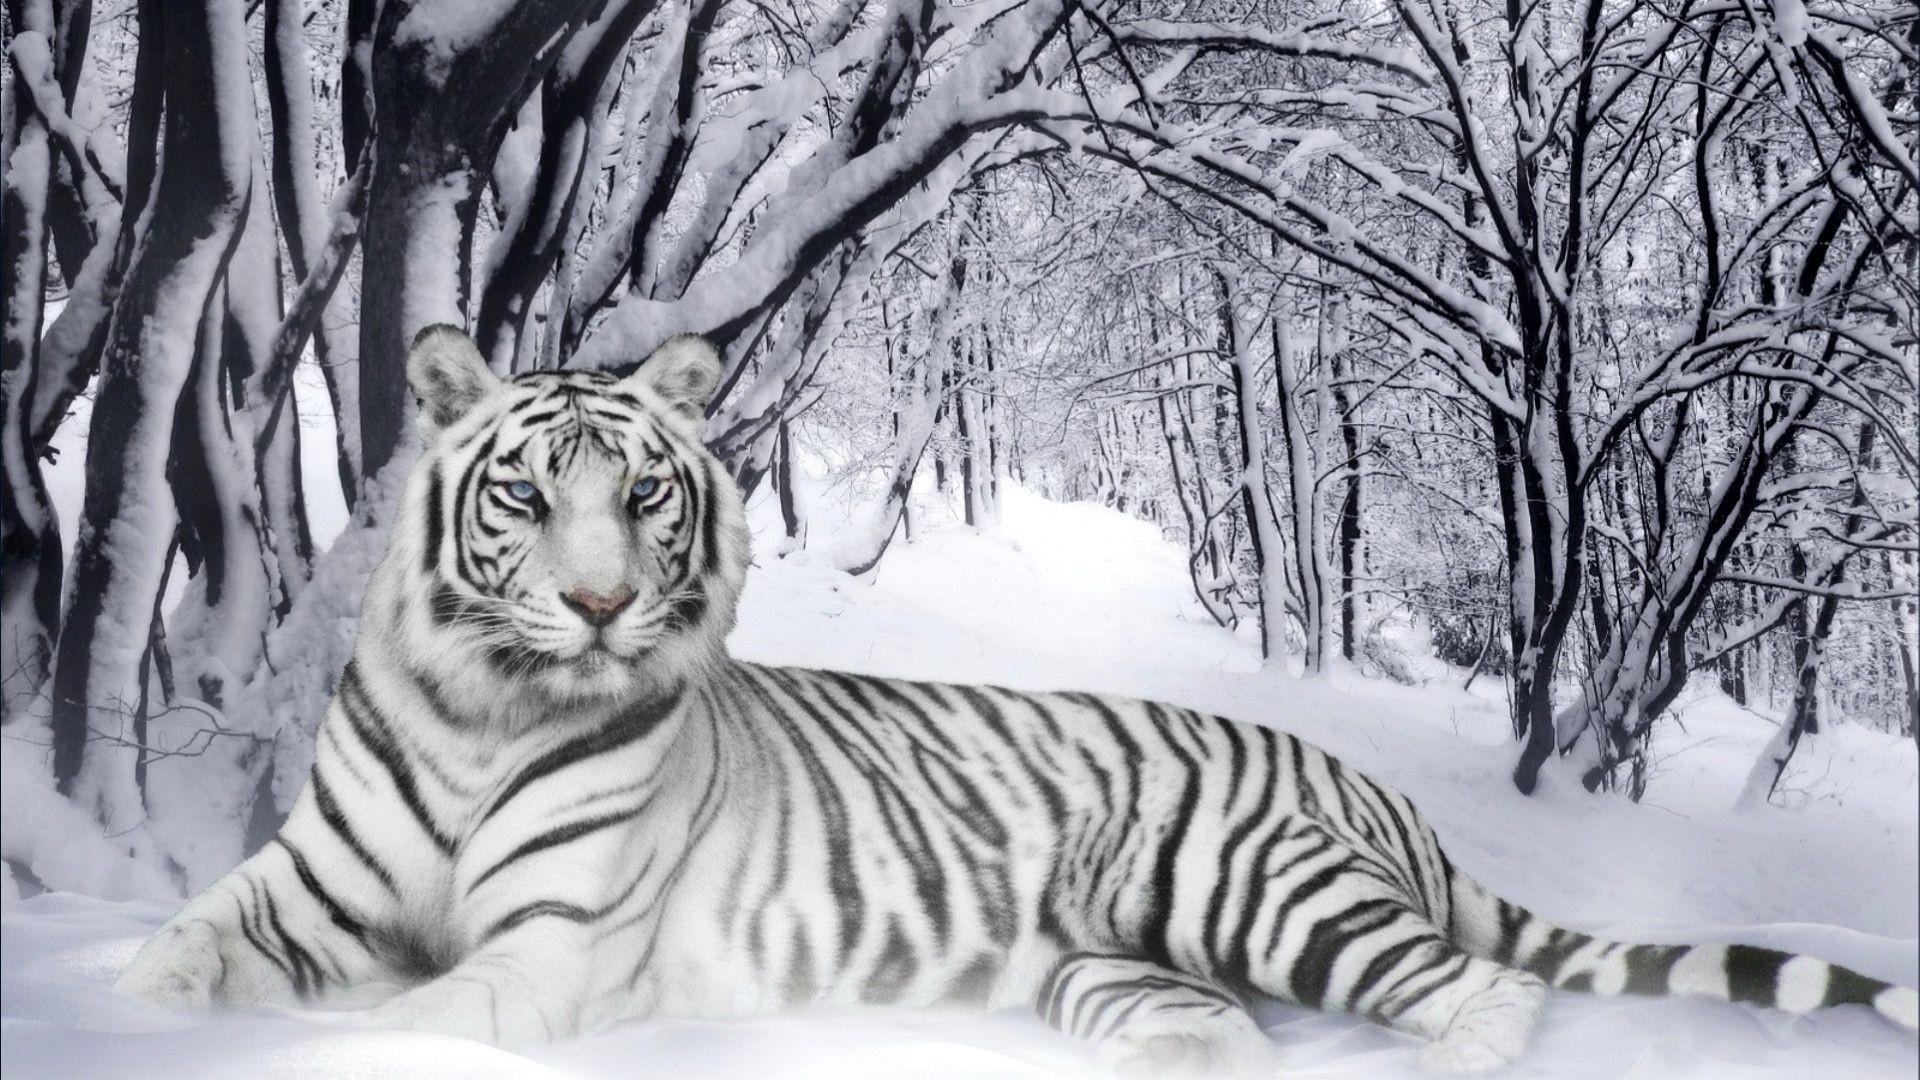 KuBiPeT.com WP.488: White Tiger, Gorgeous Pictures